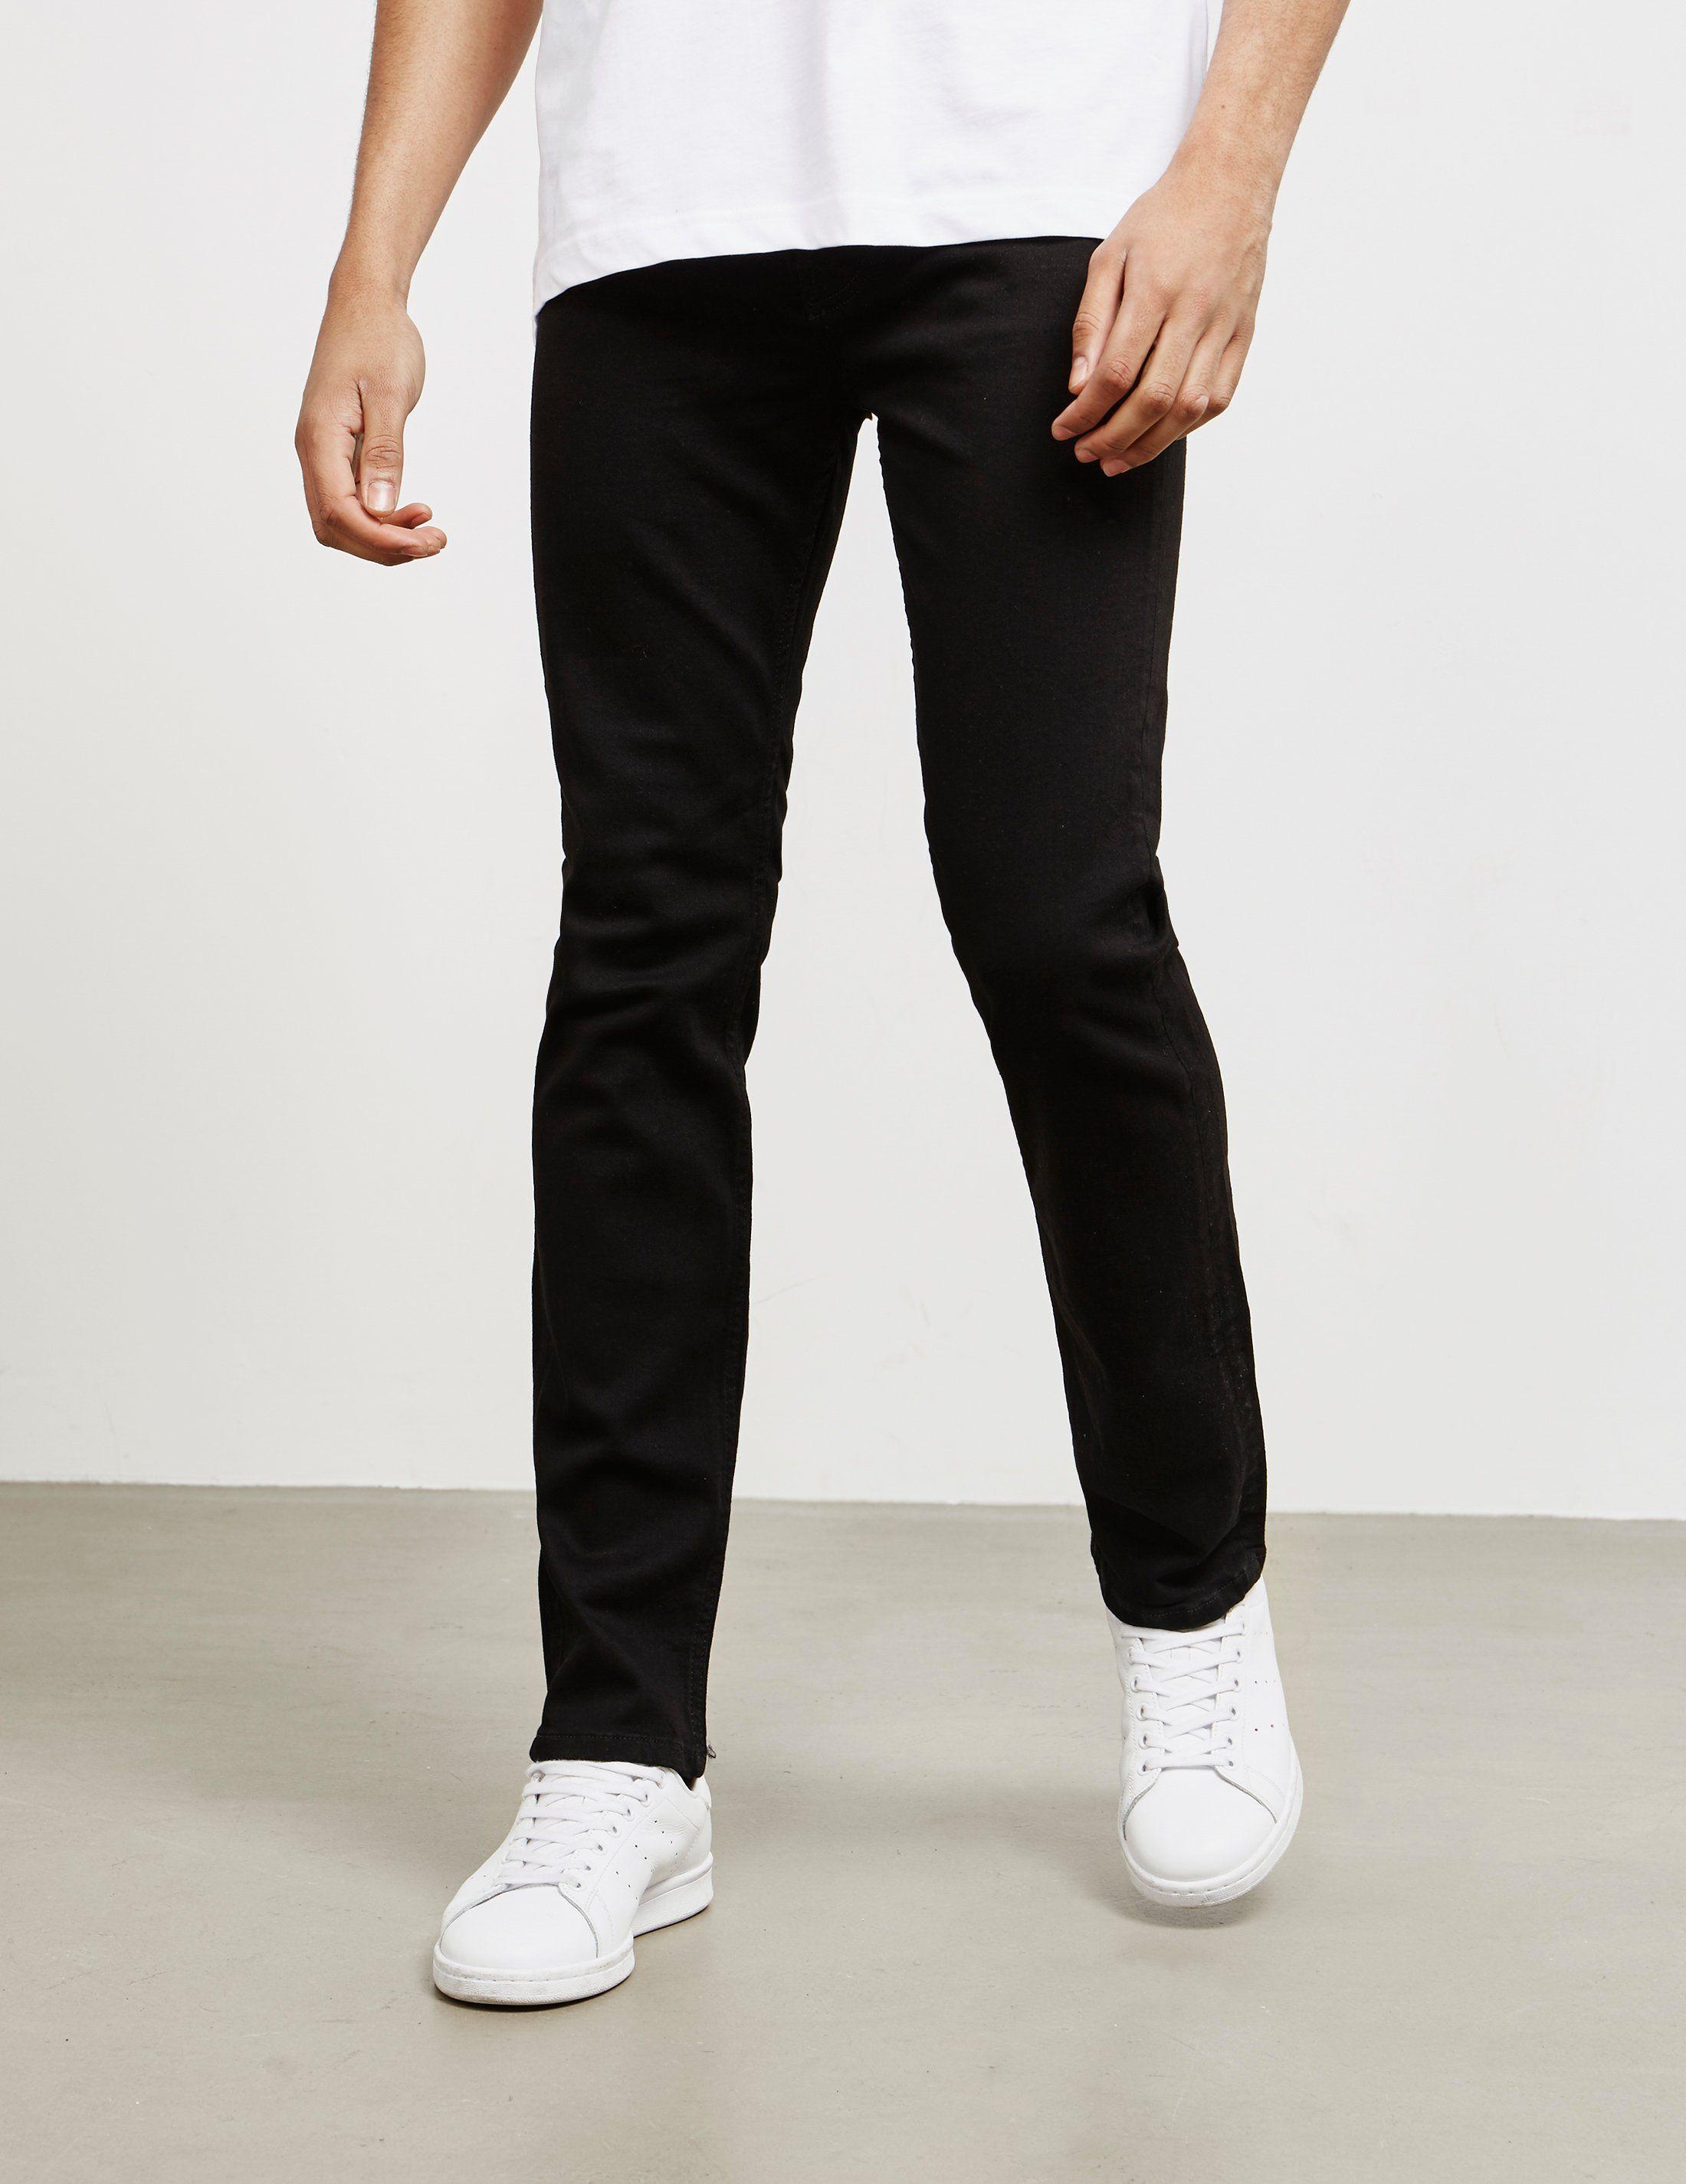 Versace Jeans Slim Logo Jeans